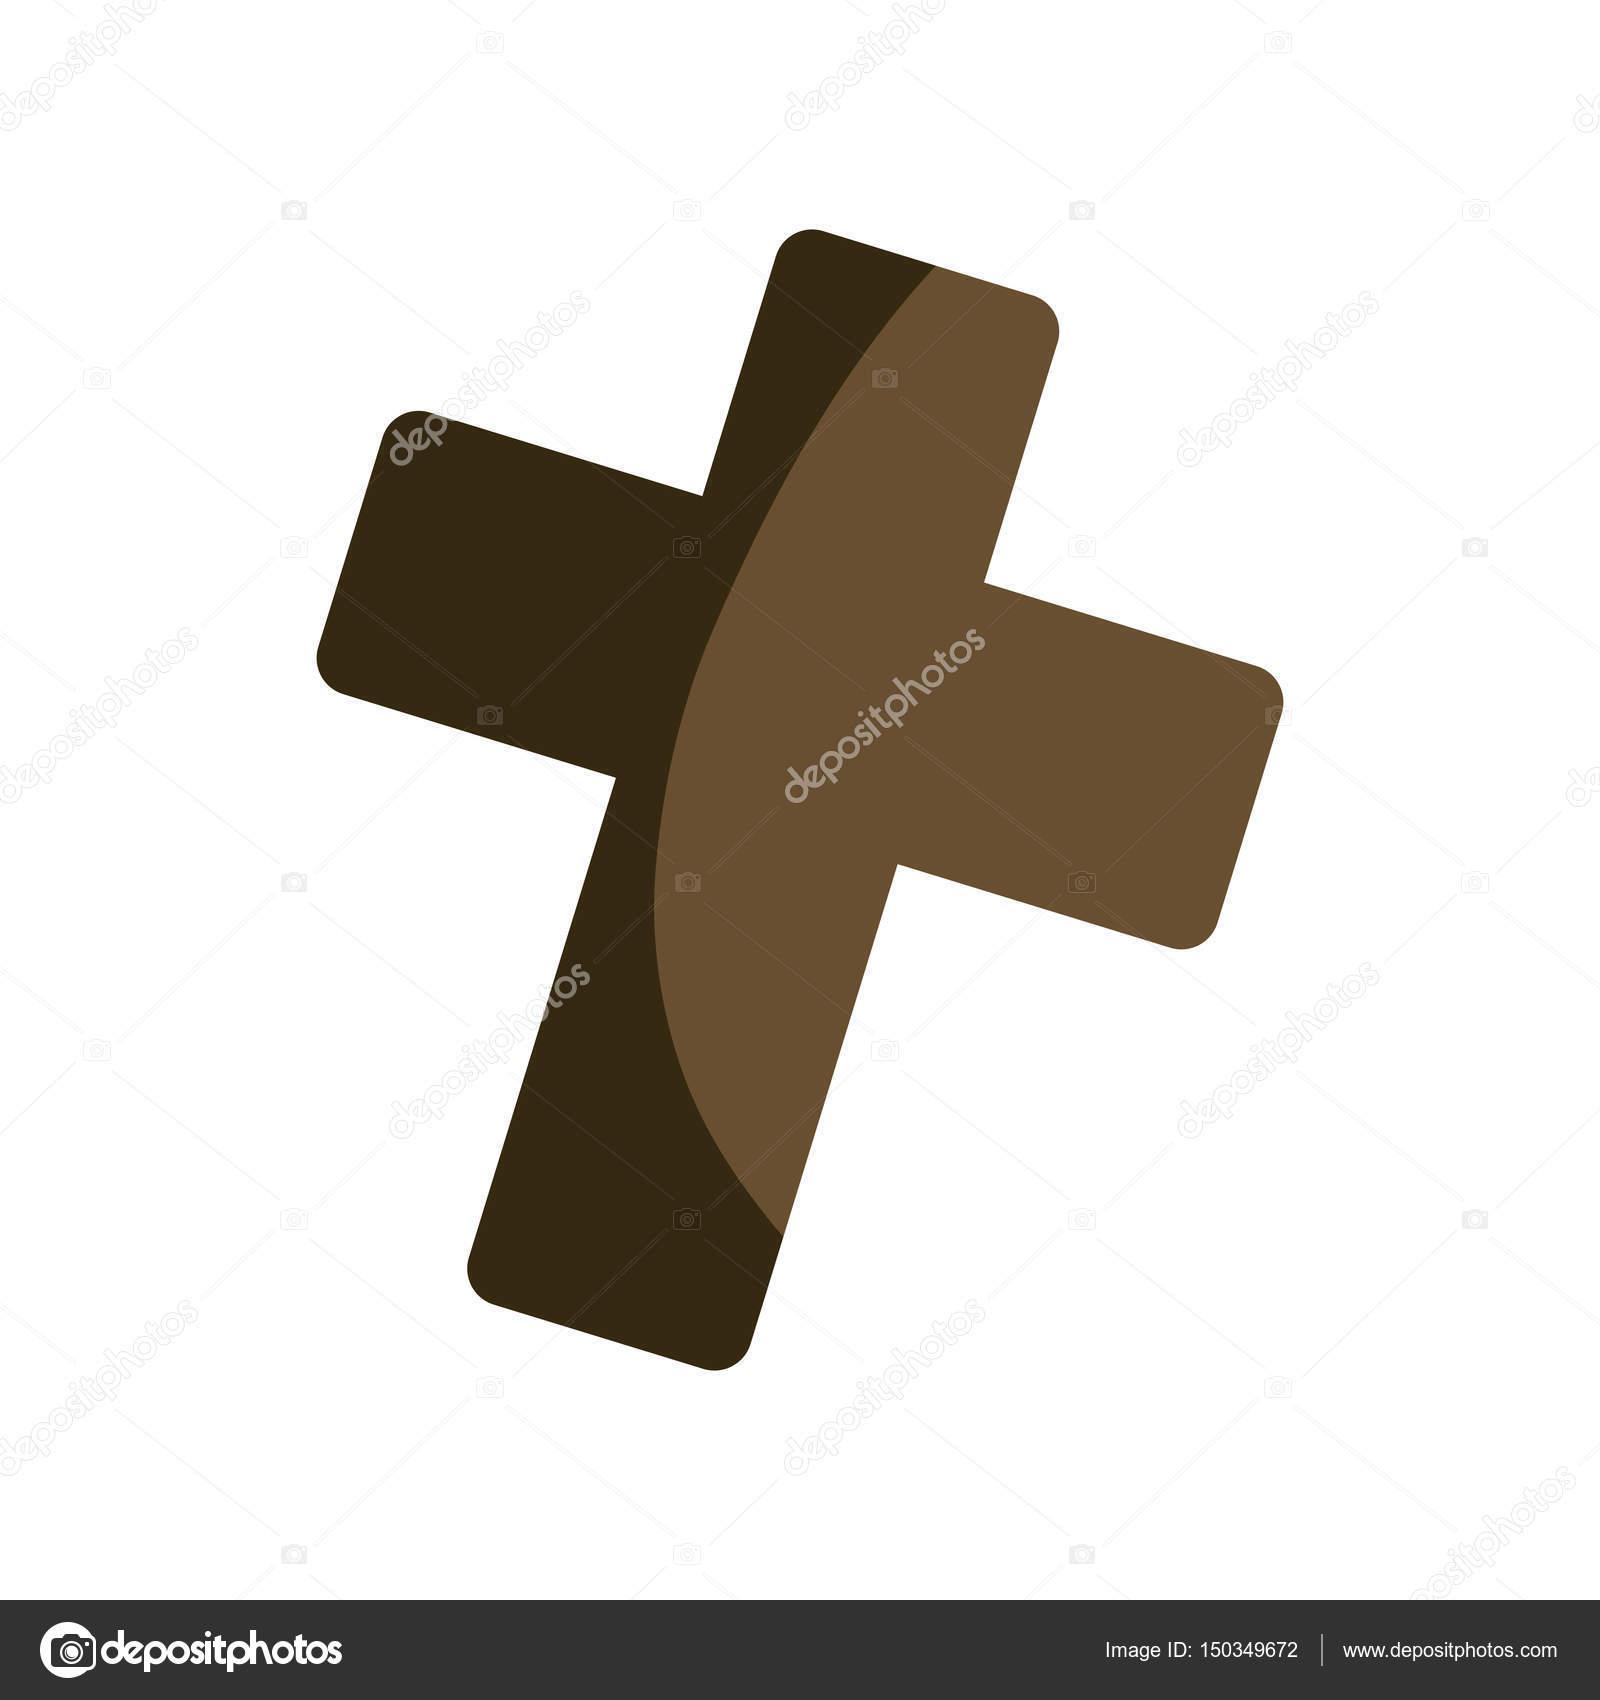 Christianity cross symbol stock vector djv 150349672 christianity cross symbol icon vector illustration graphic design vector by djv biocorpaavc Gallery